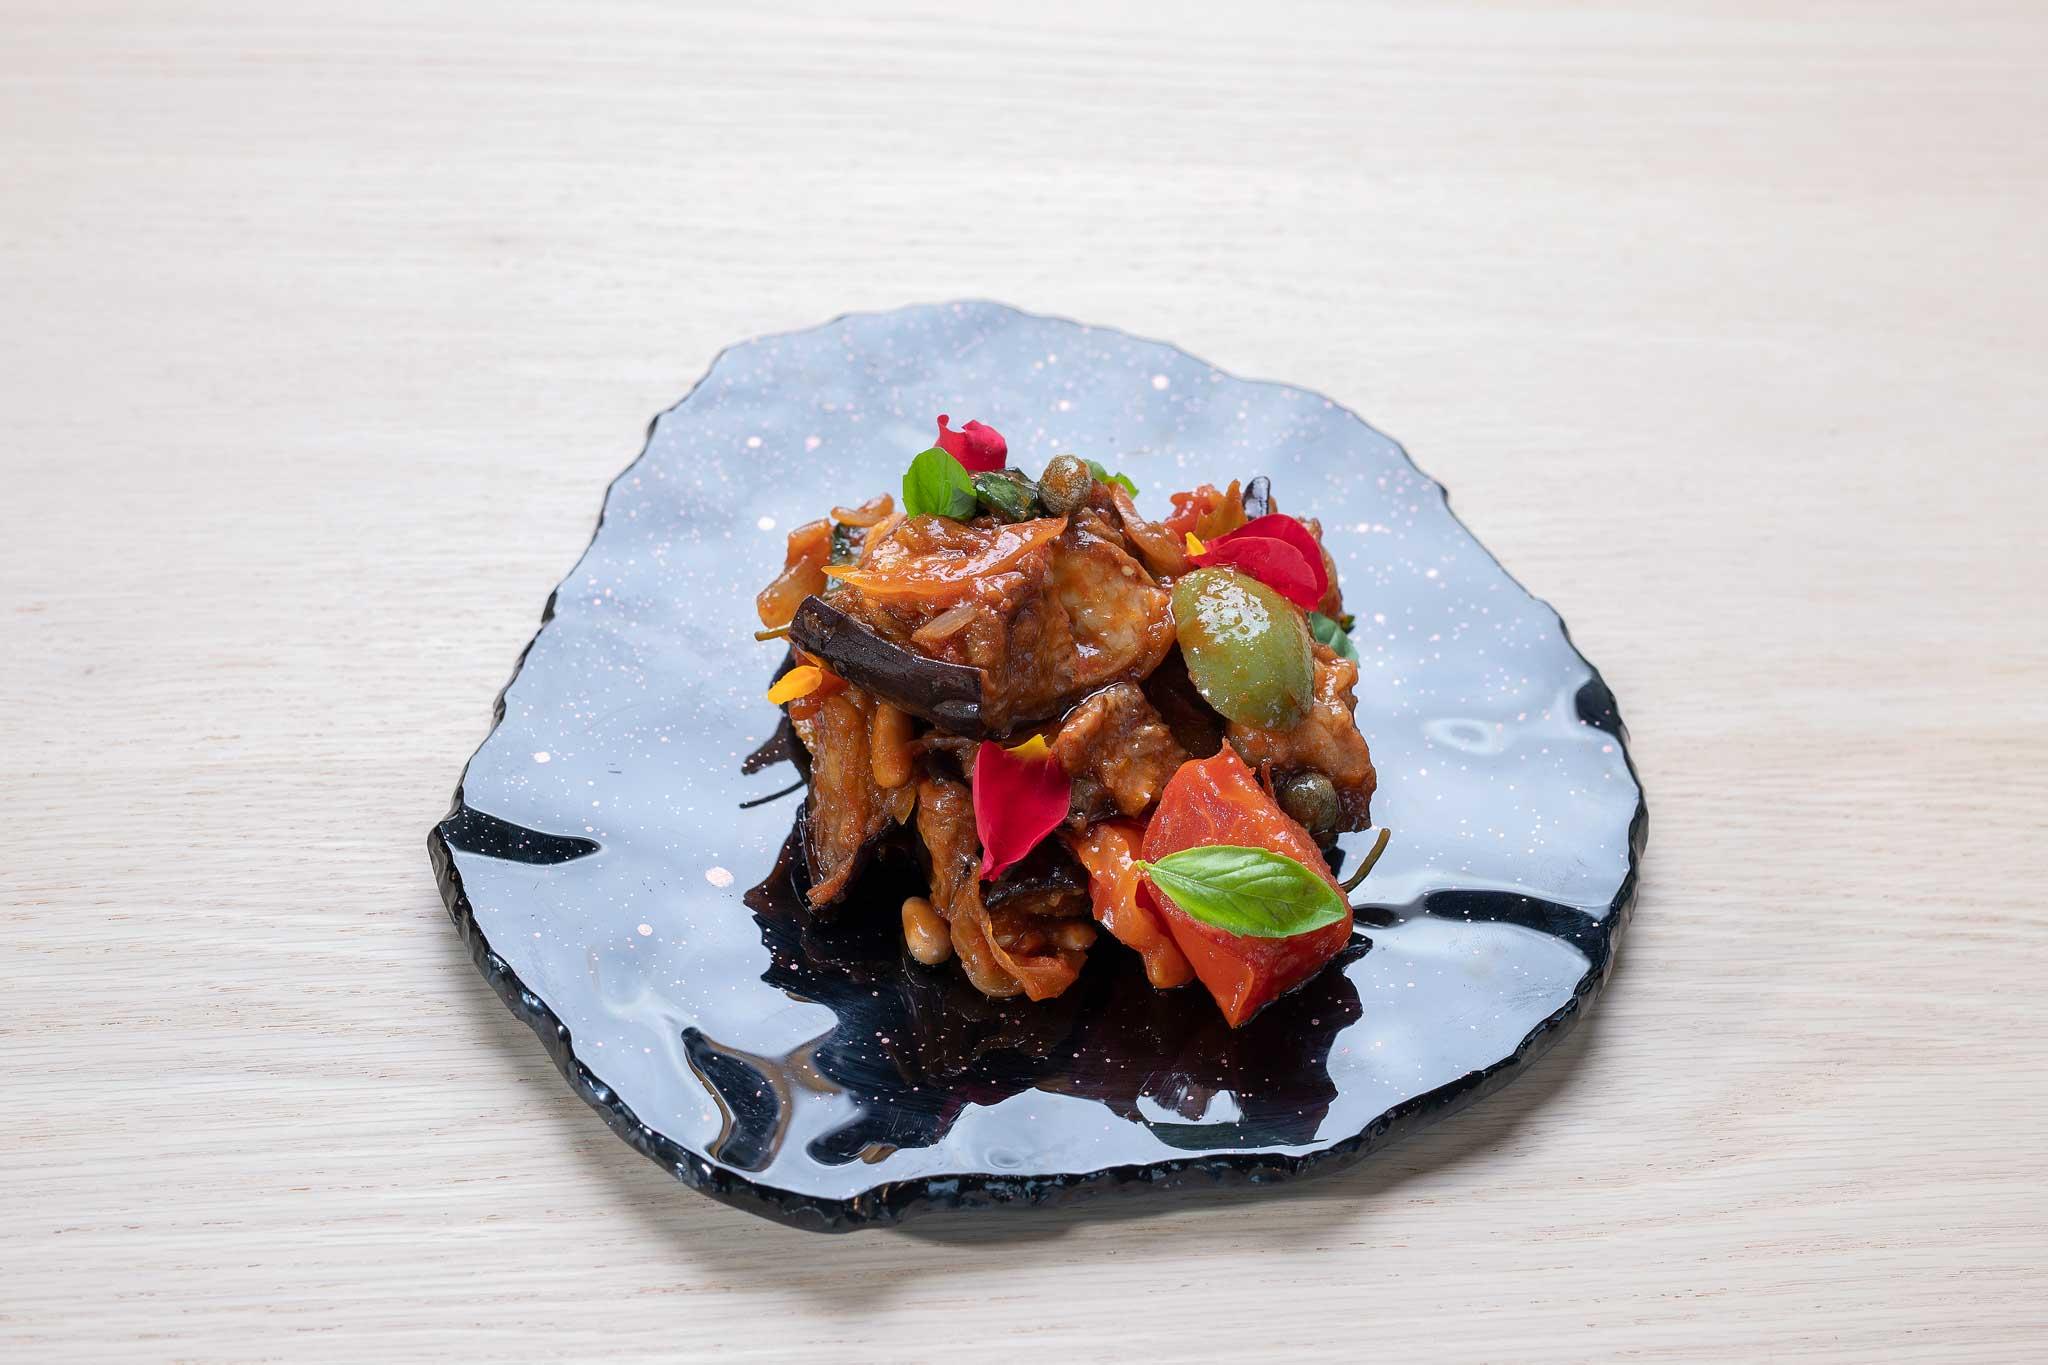 Mejor sitio para comer en Denia – Restaurante Nomada